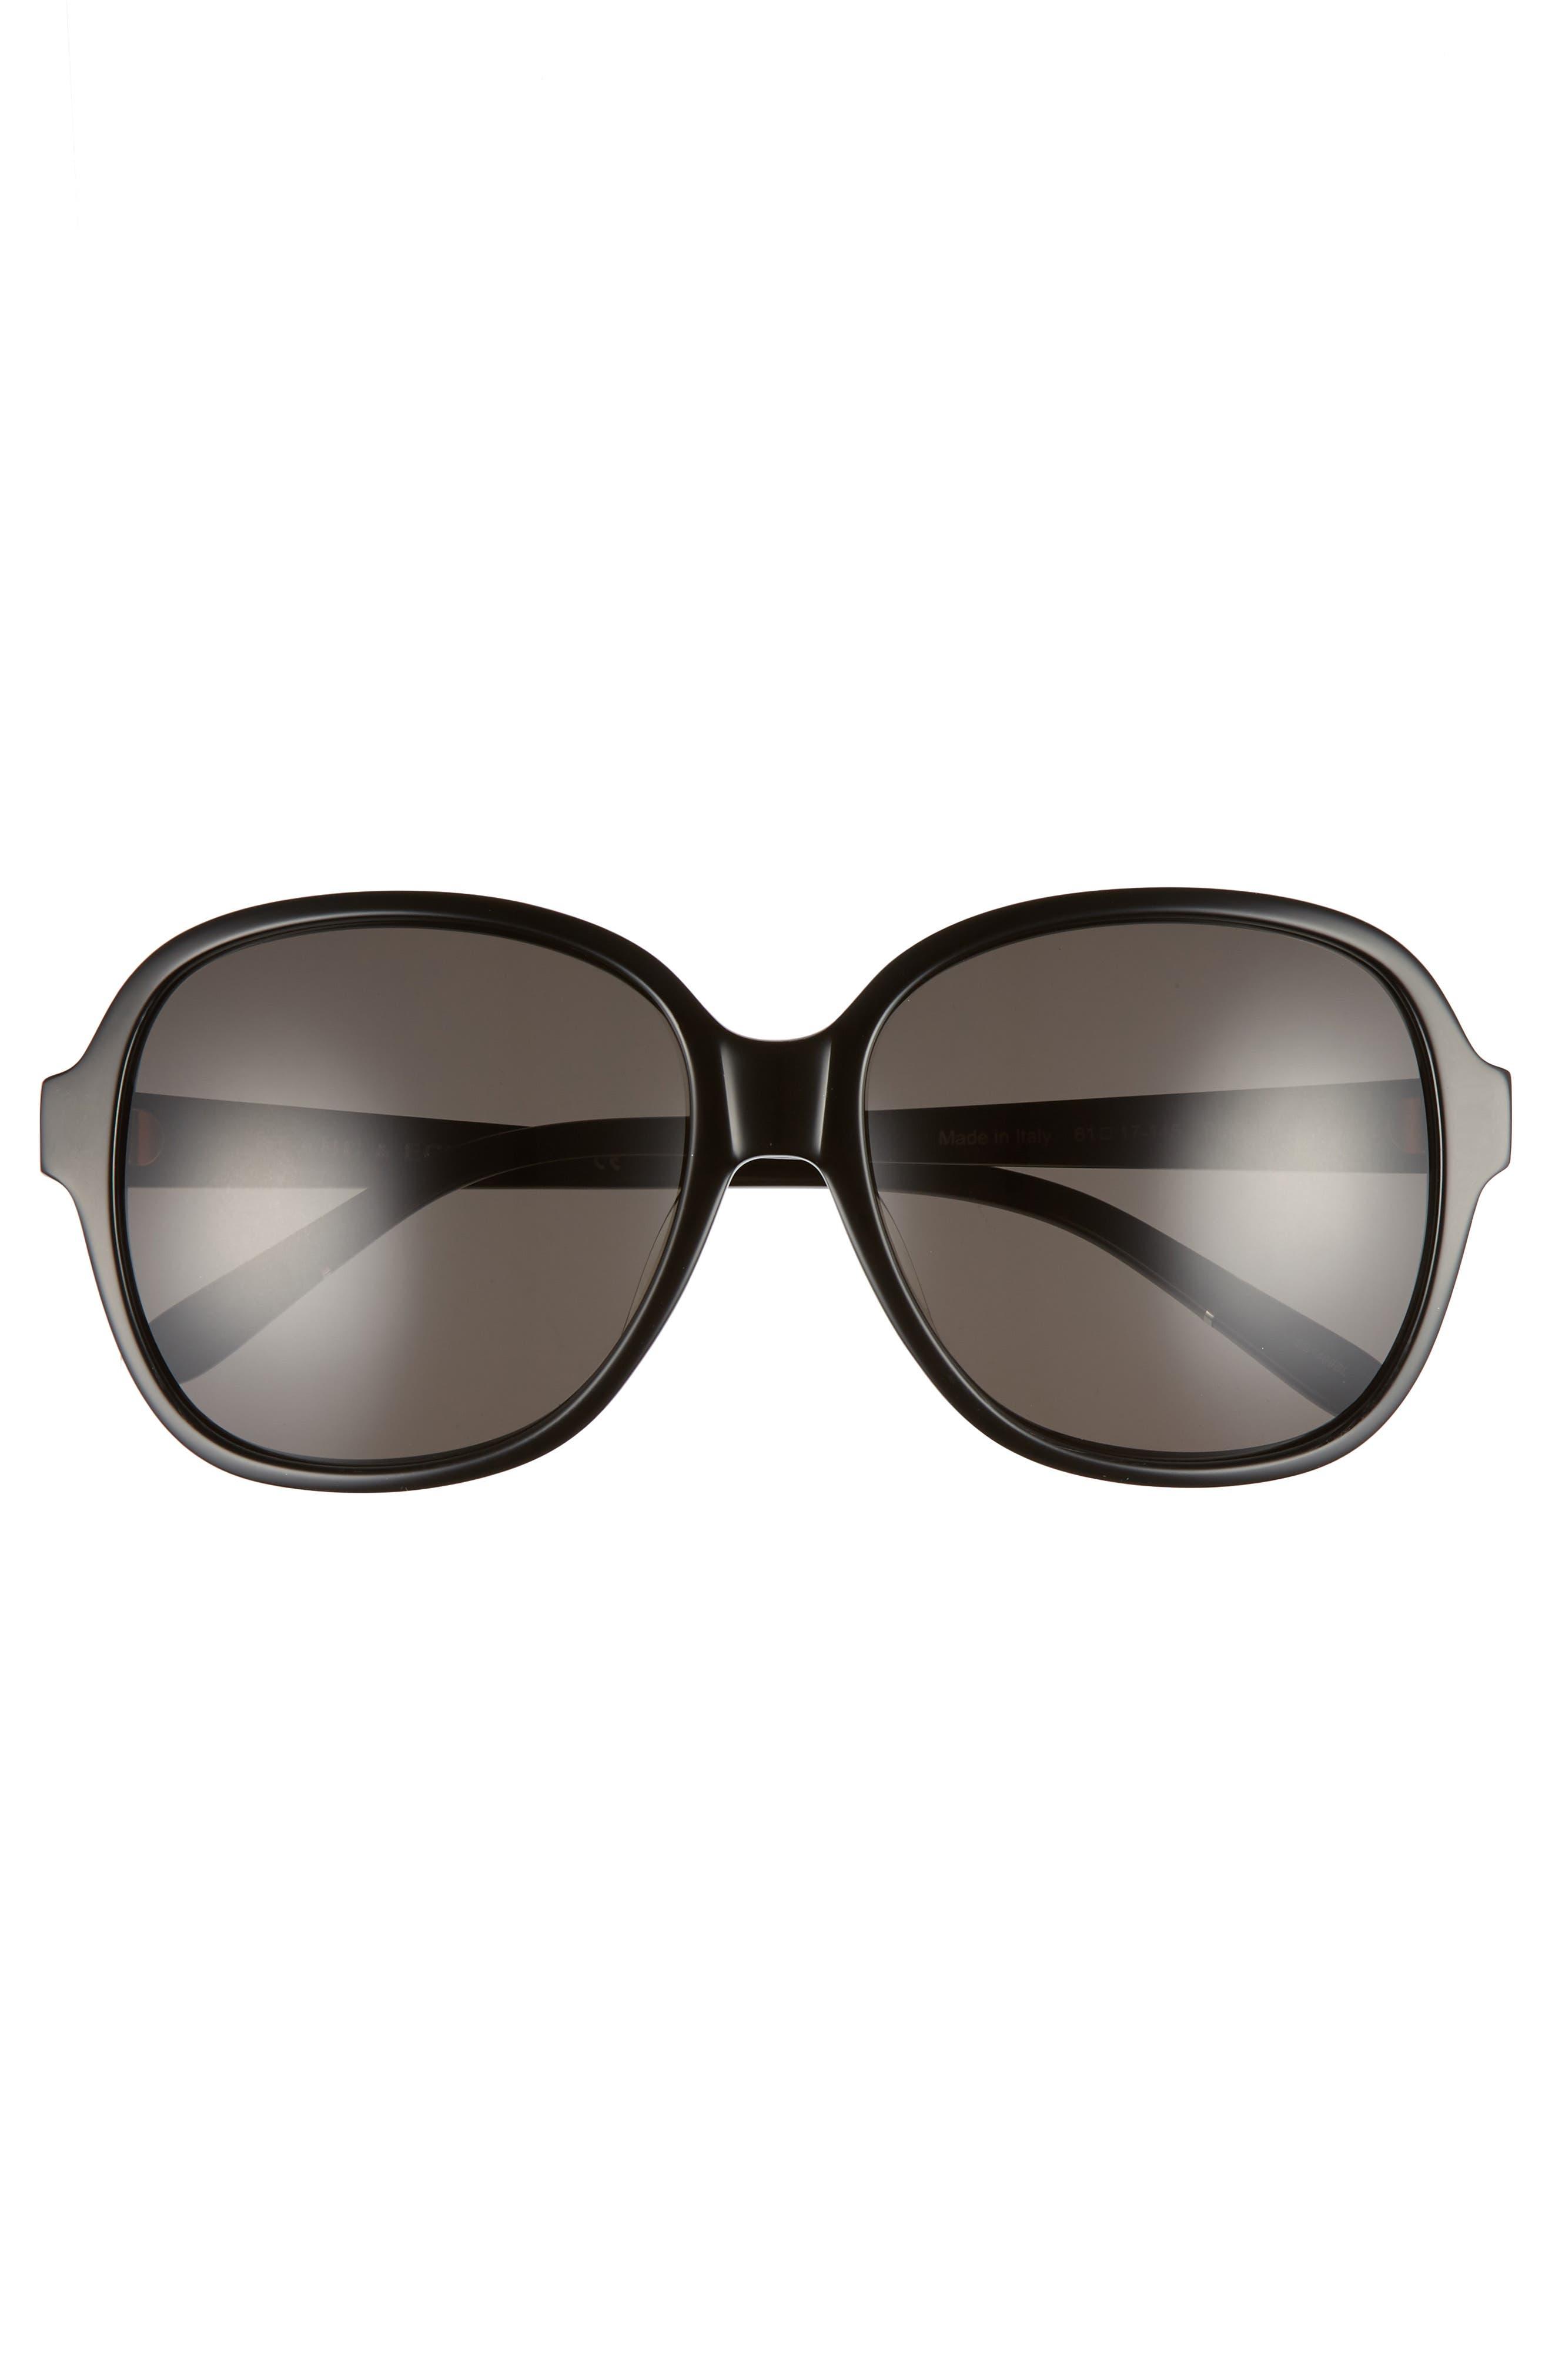 BLANC & ECLARE Beijing 61mm Polarized Sunglasses,                             Alternate thumbnail 3, color,                             BLACK